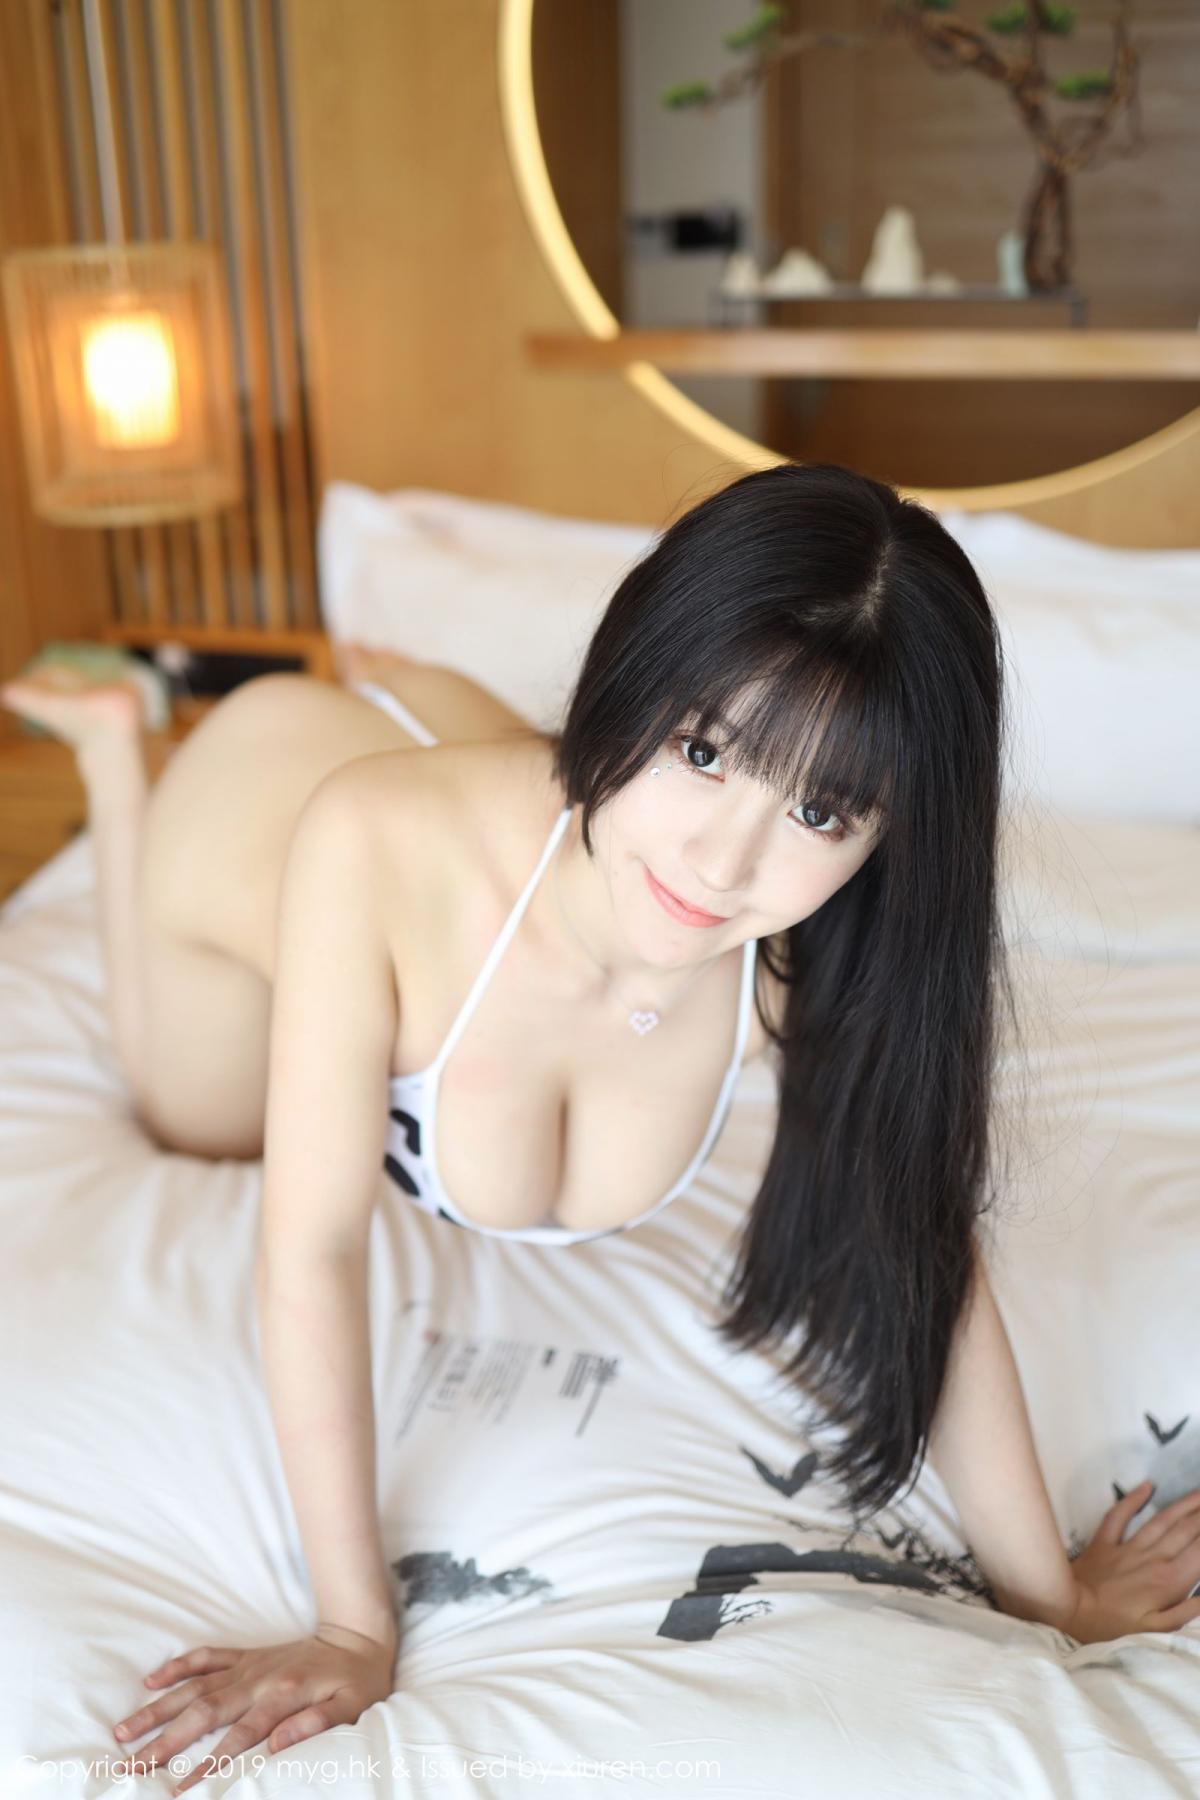 [MyGirl] Vol.370 Zhu Ke Er 24P, mygirl, Underwear, Zhu Ke Er